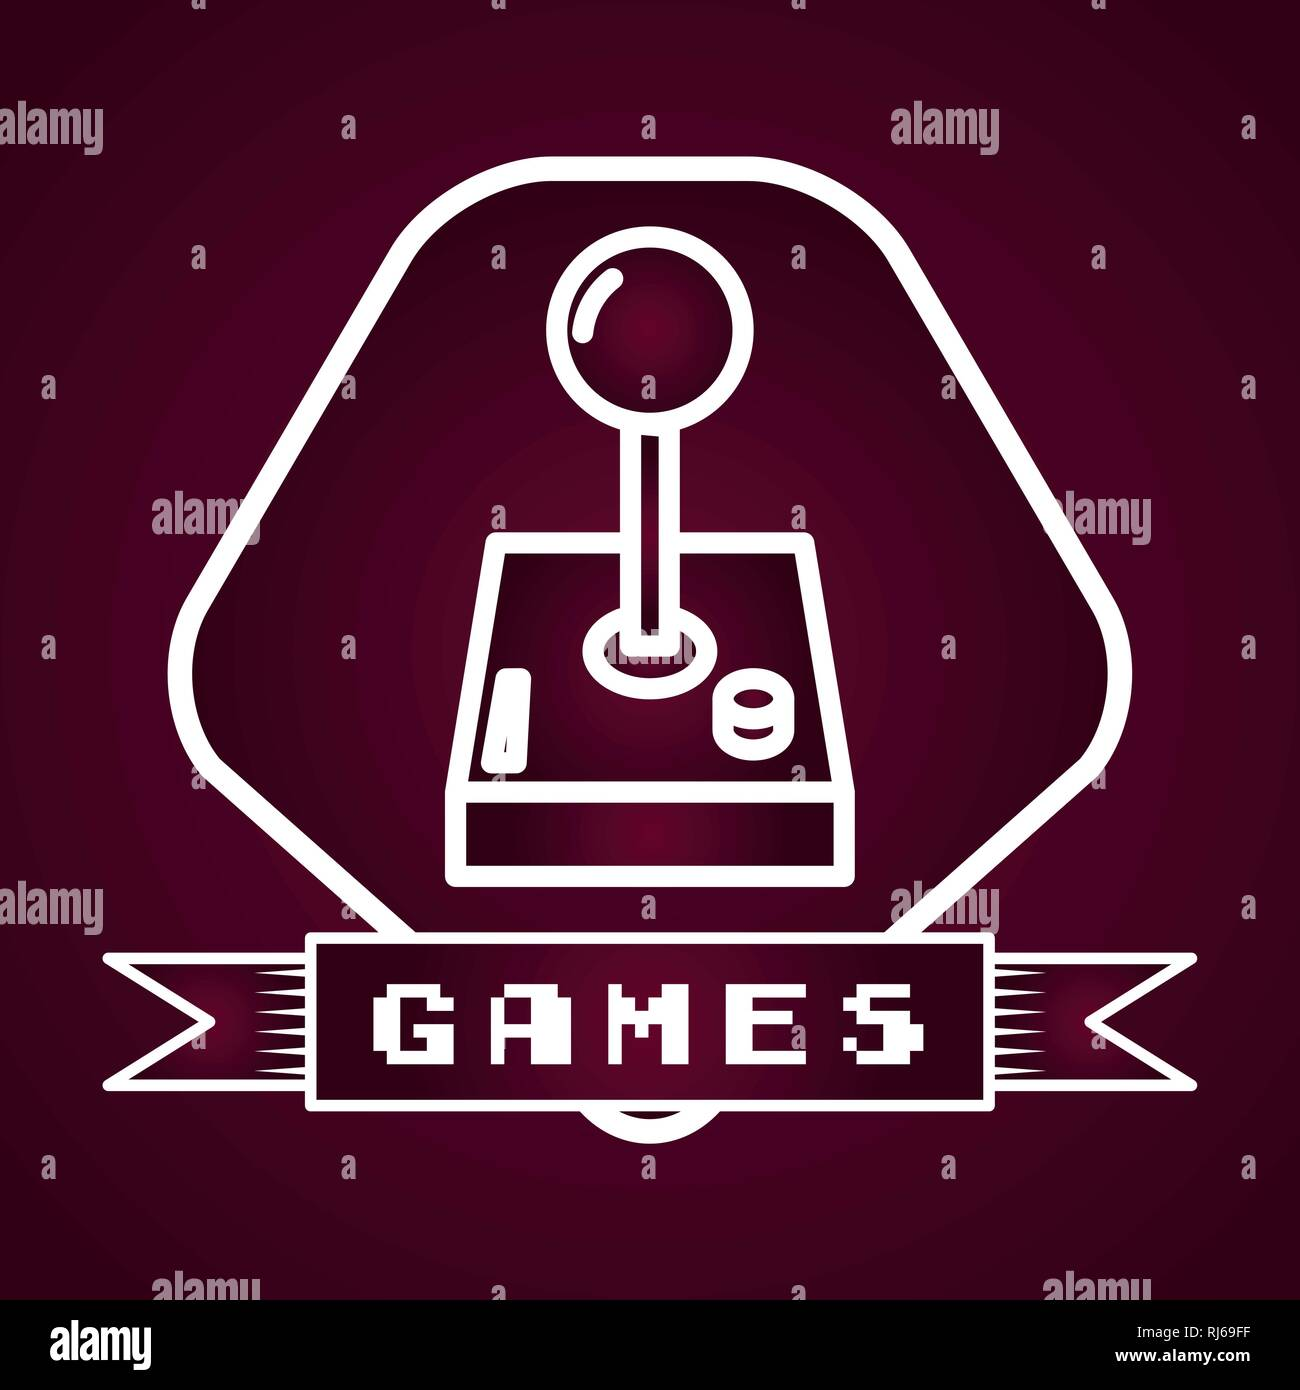 joystick video game - Stock Image